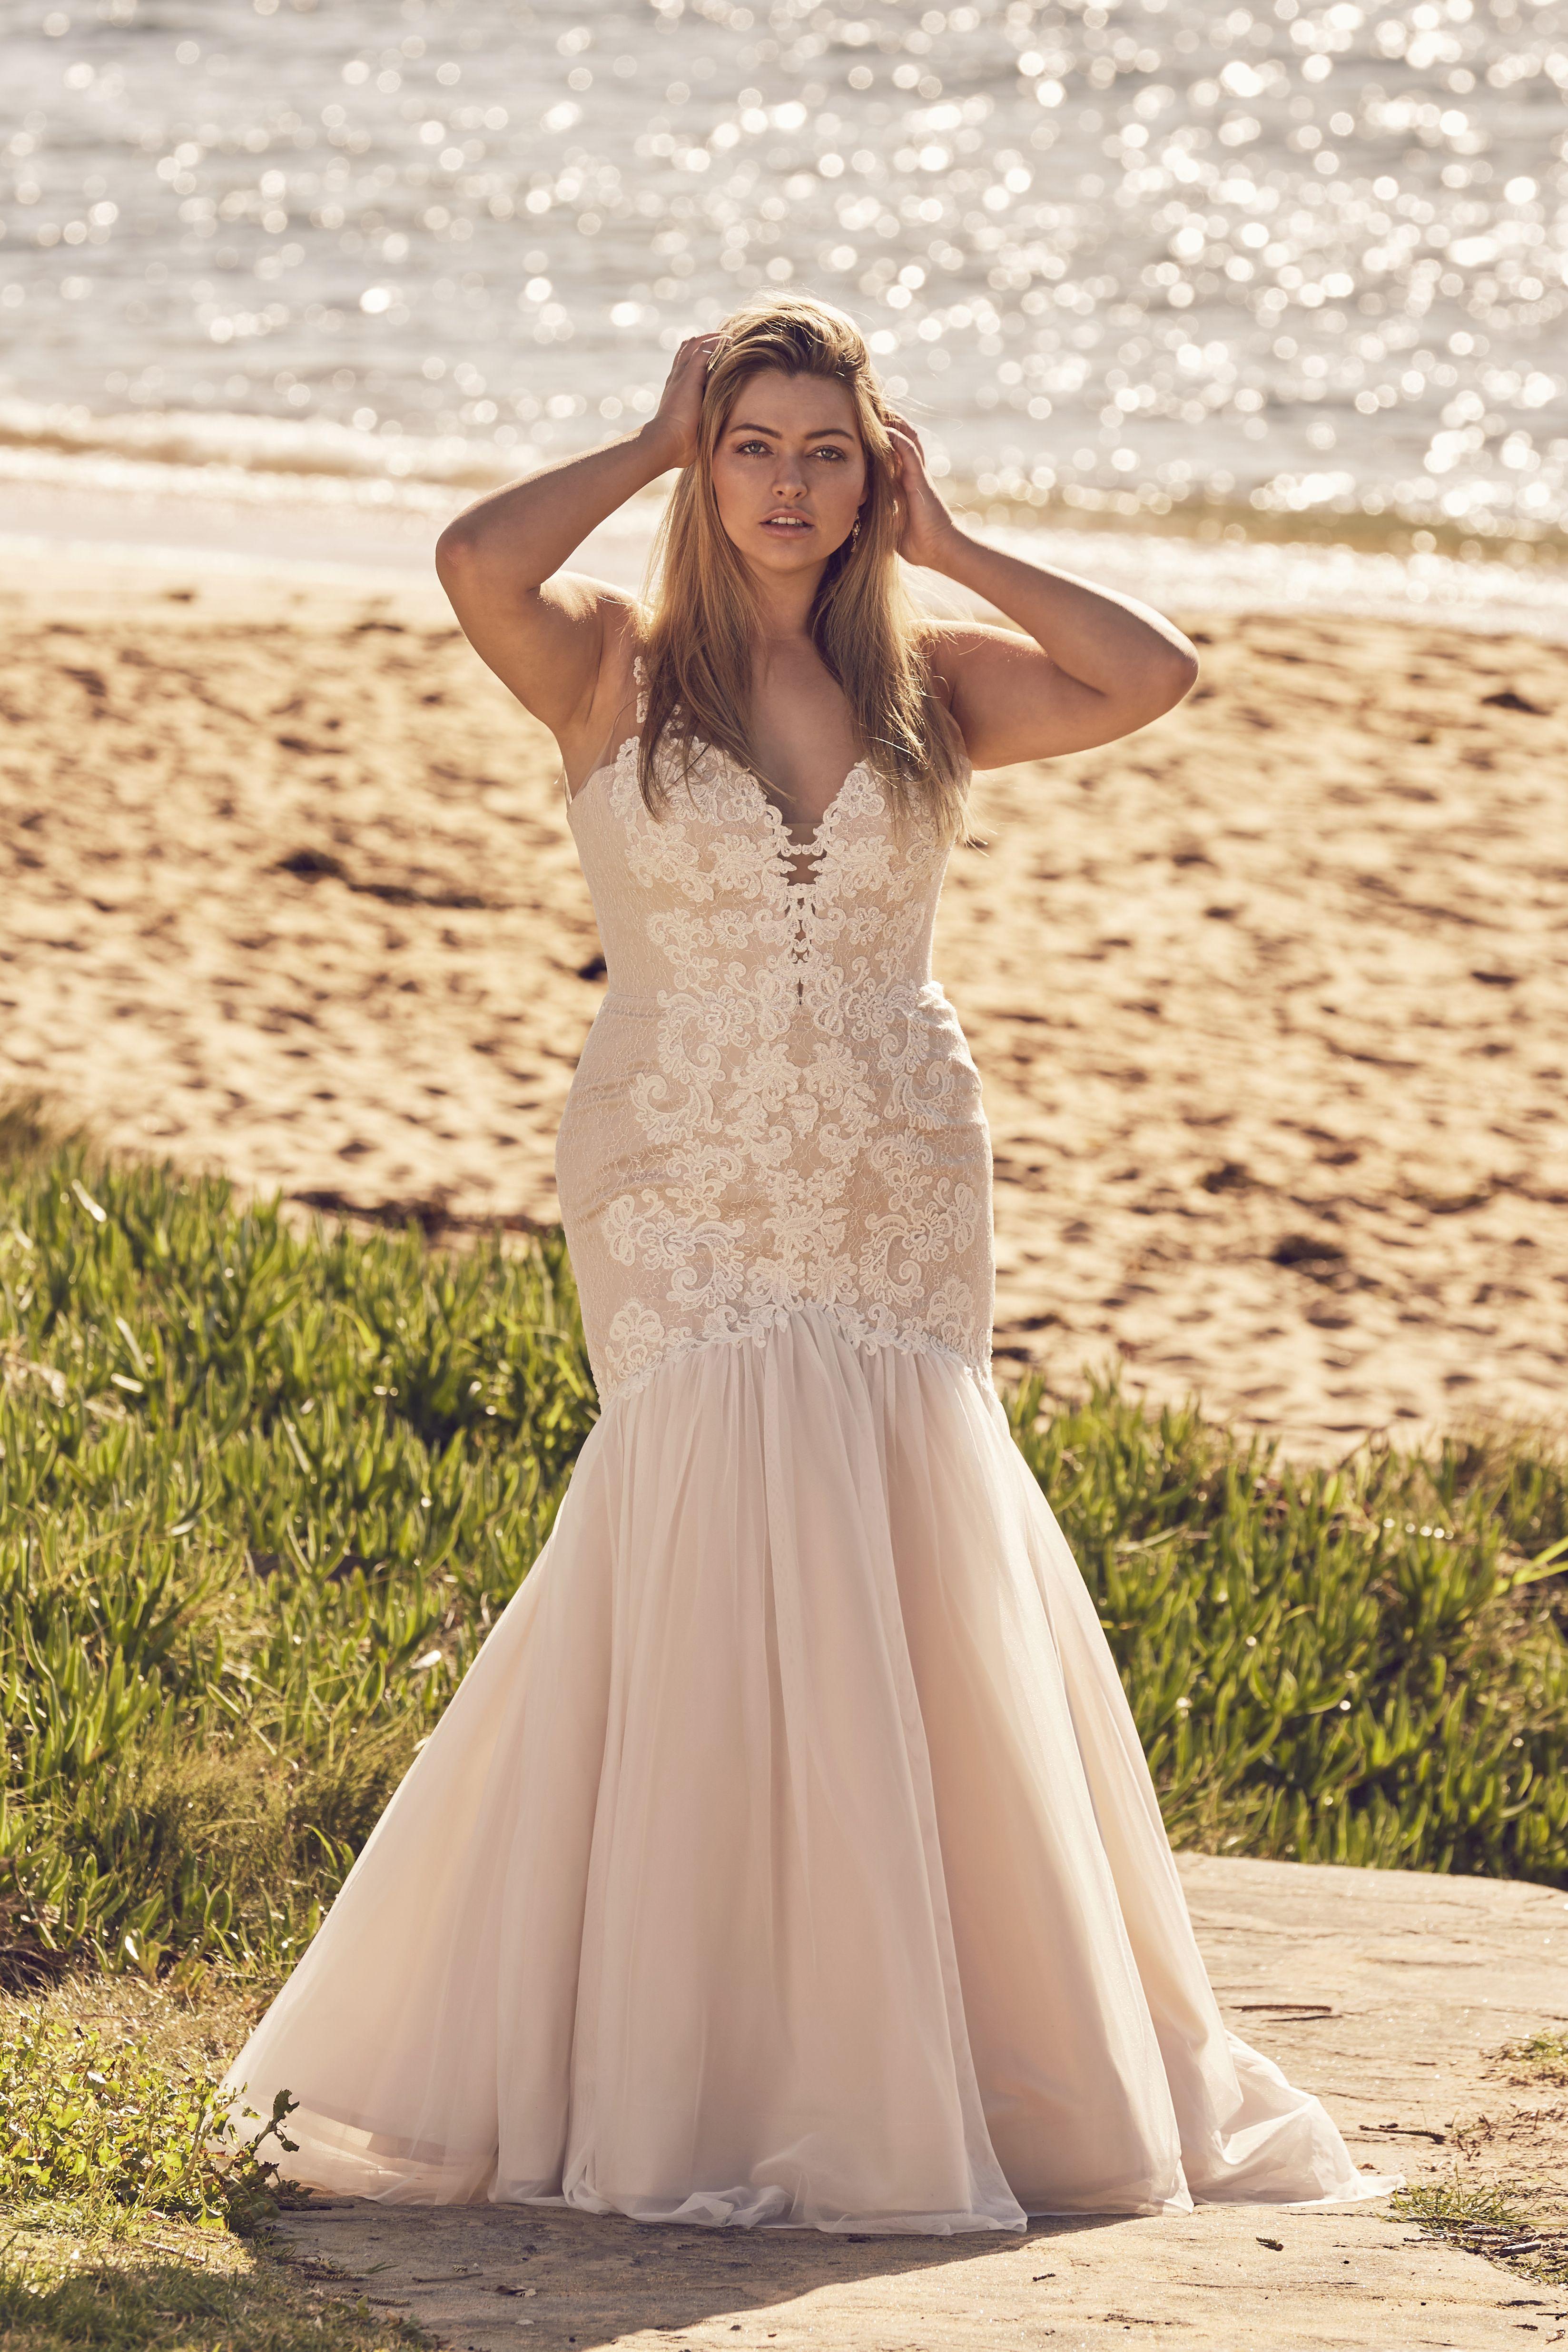 Chianti Mermaid Wedding Gown For Curvy Brides Curvy Wedding Dress Wedding Gowns Mermaid Bridal Outfits [ 4943 x 3295 Pixel ]